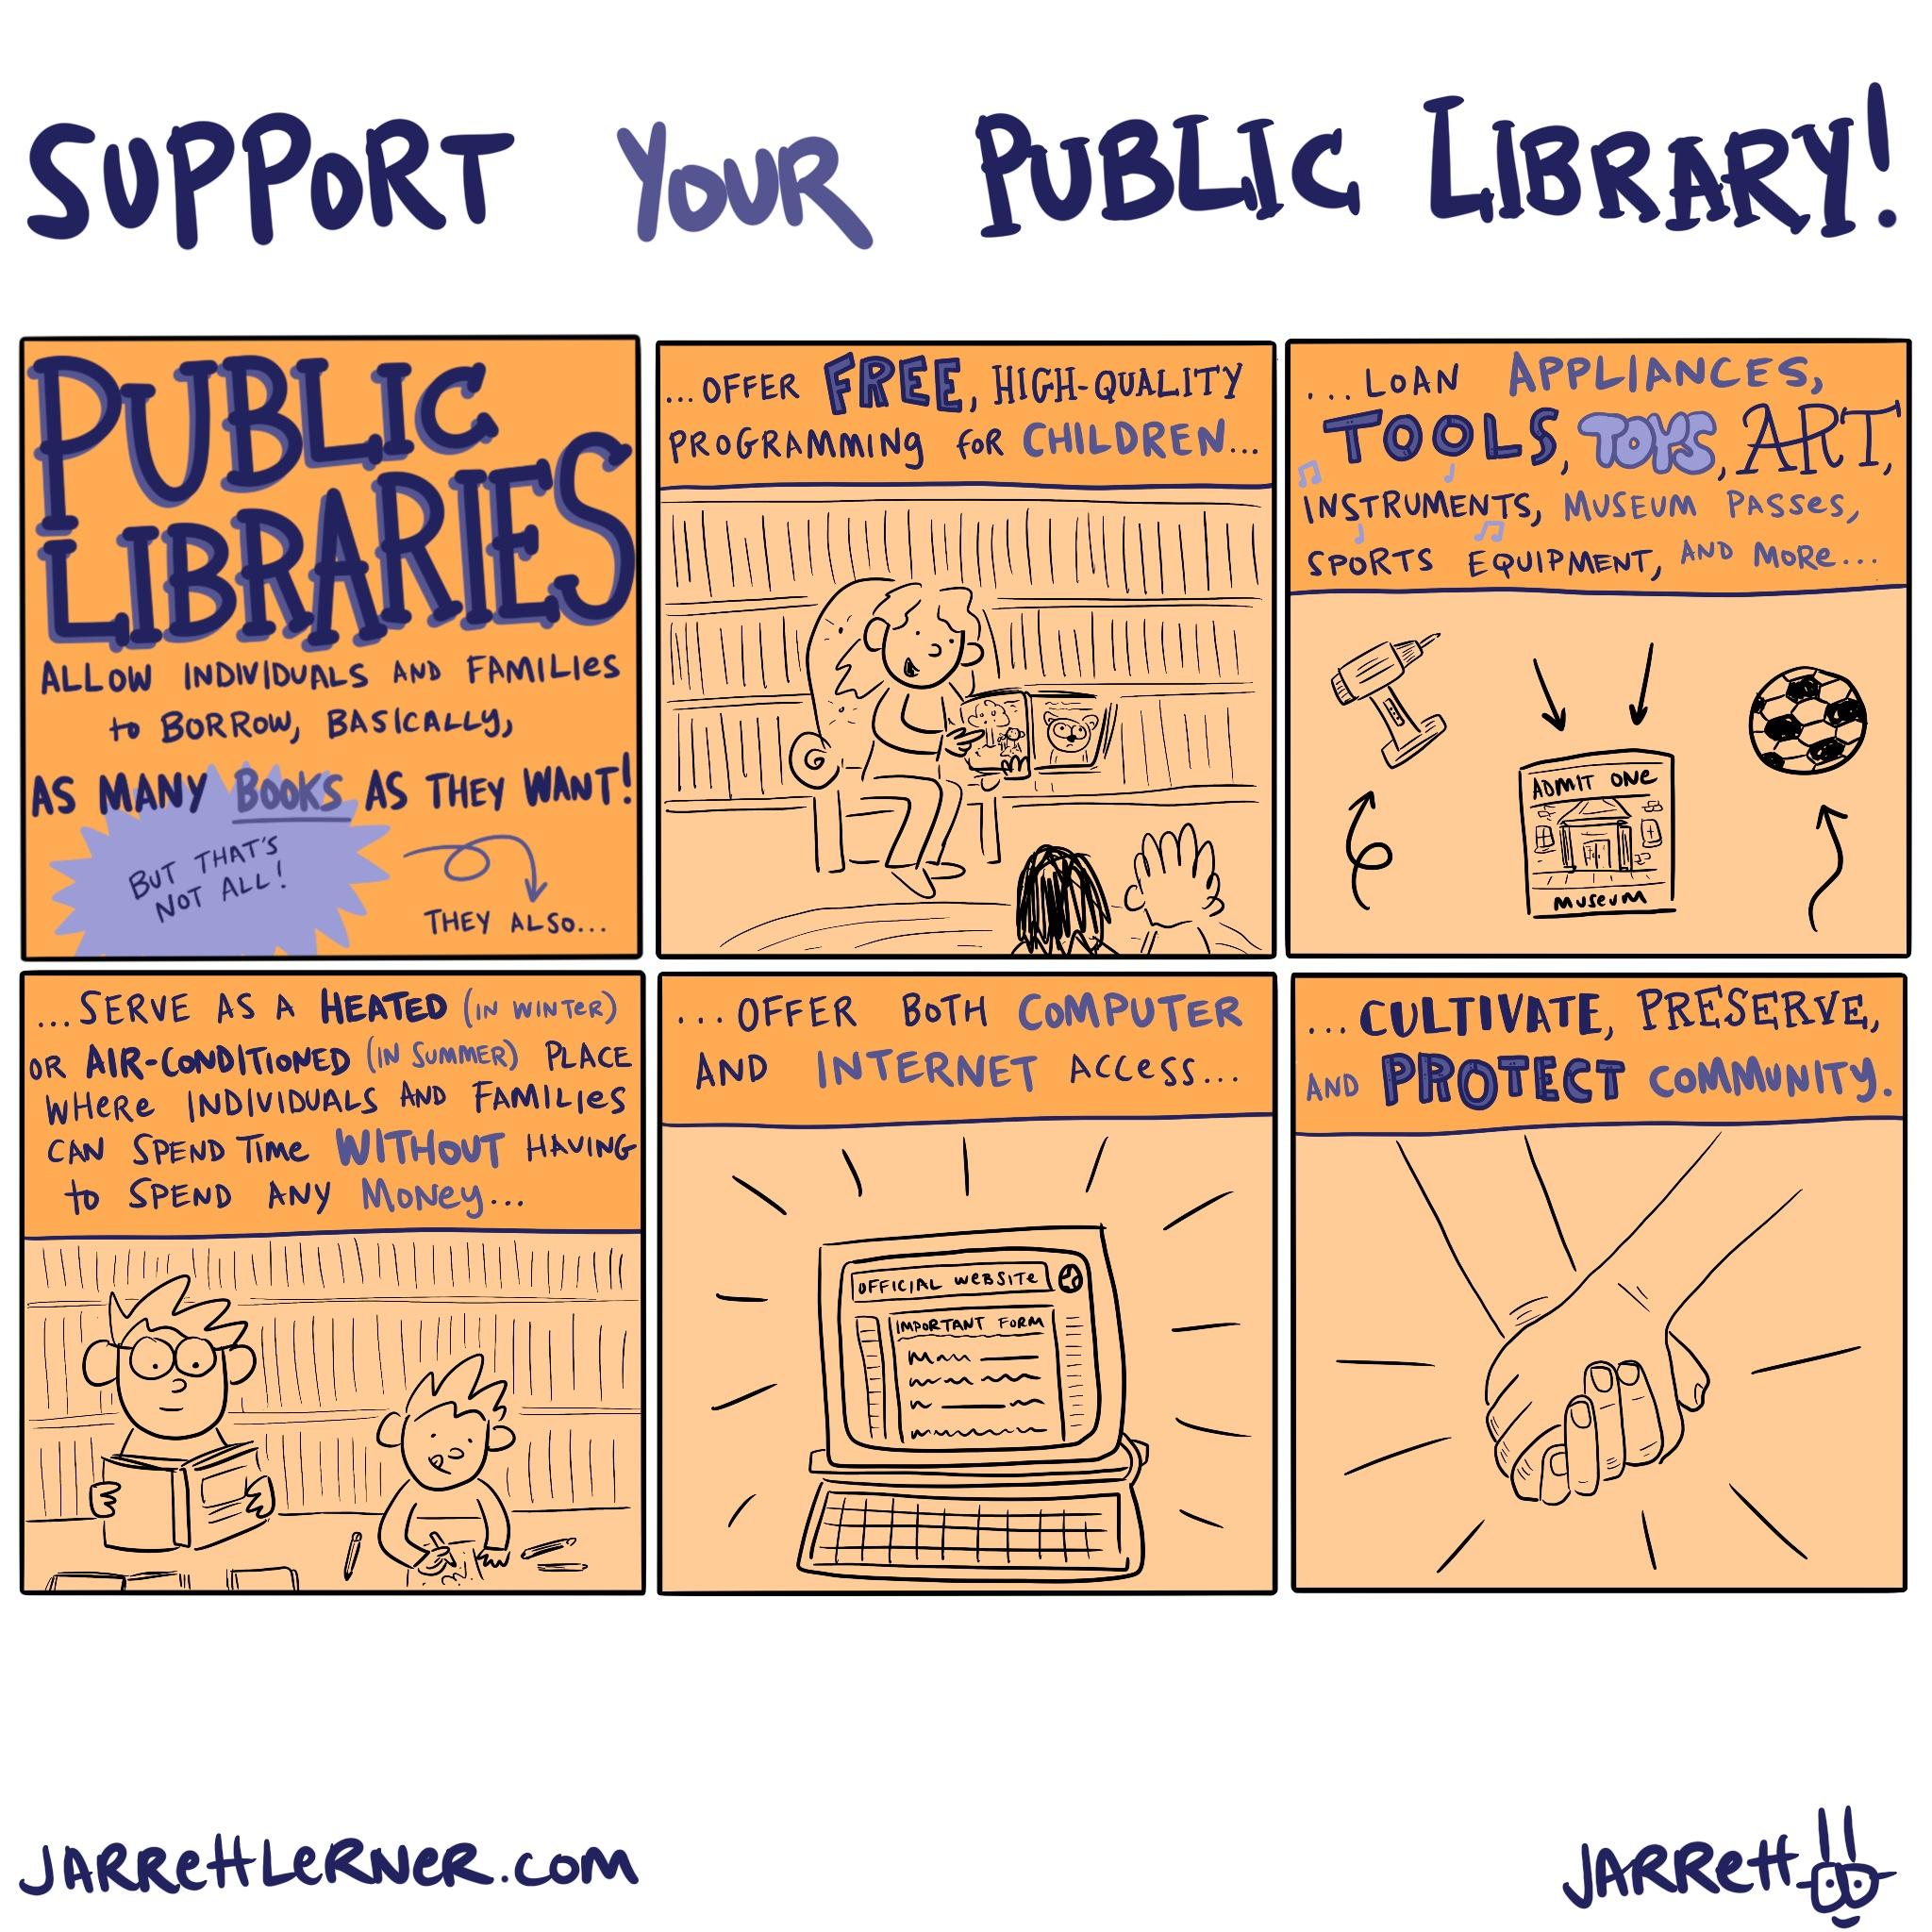 public libraries.jpg